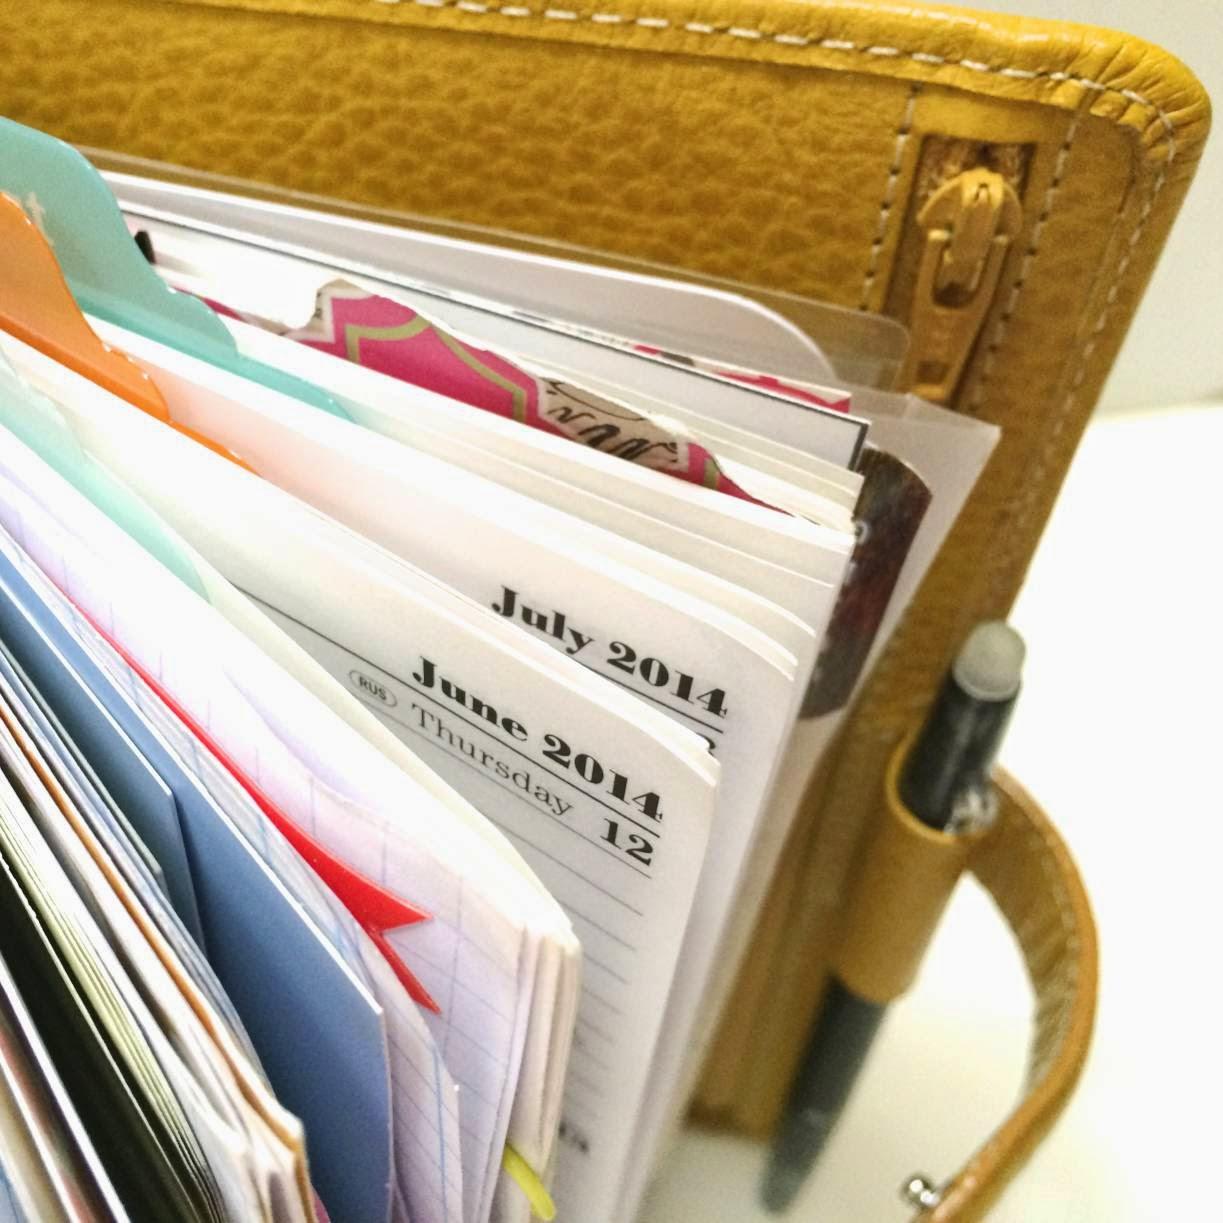 Organizing in your Filofax Planner | iloveitallwithmonikawright.com